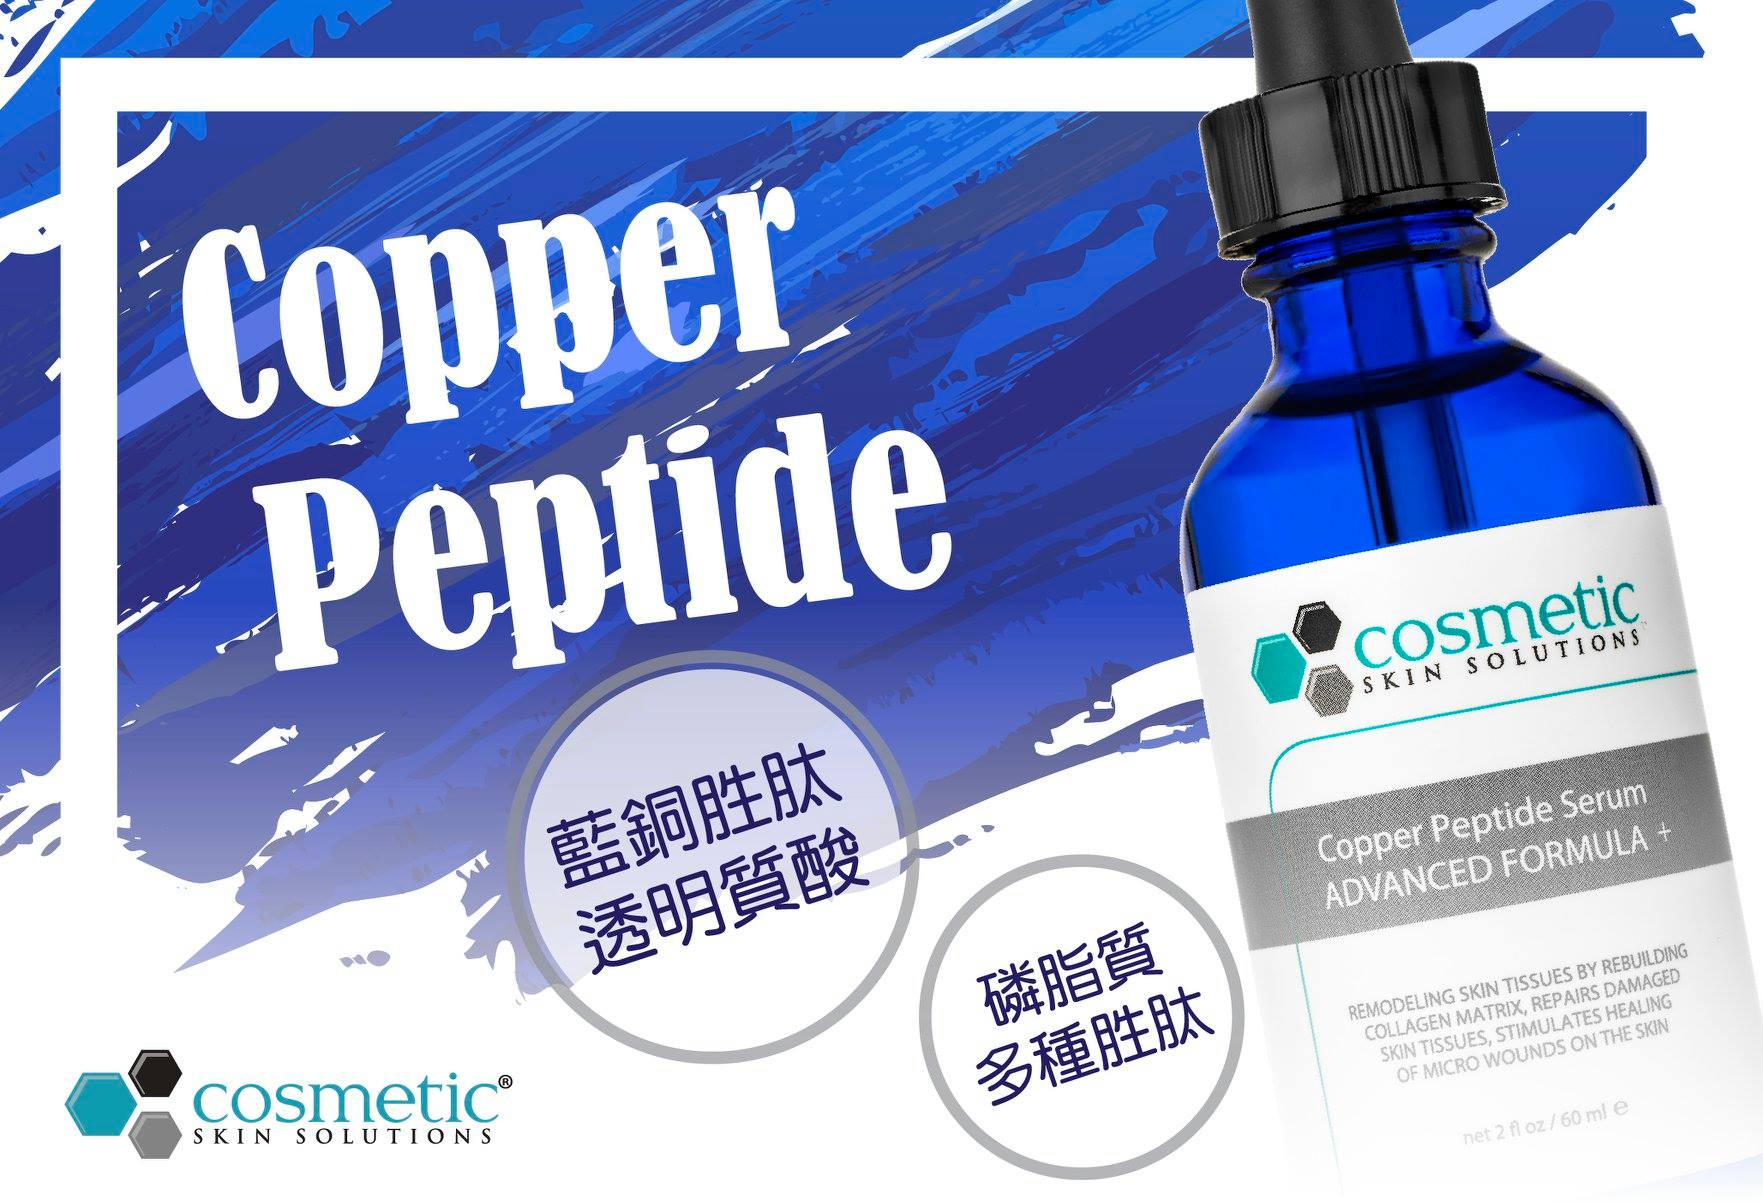 CSS 藍銅胜肽防敏嫩膚精華的圖片搜尋結果